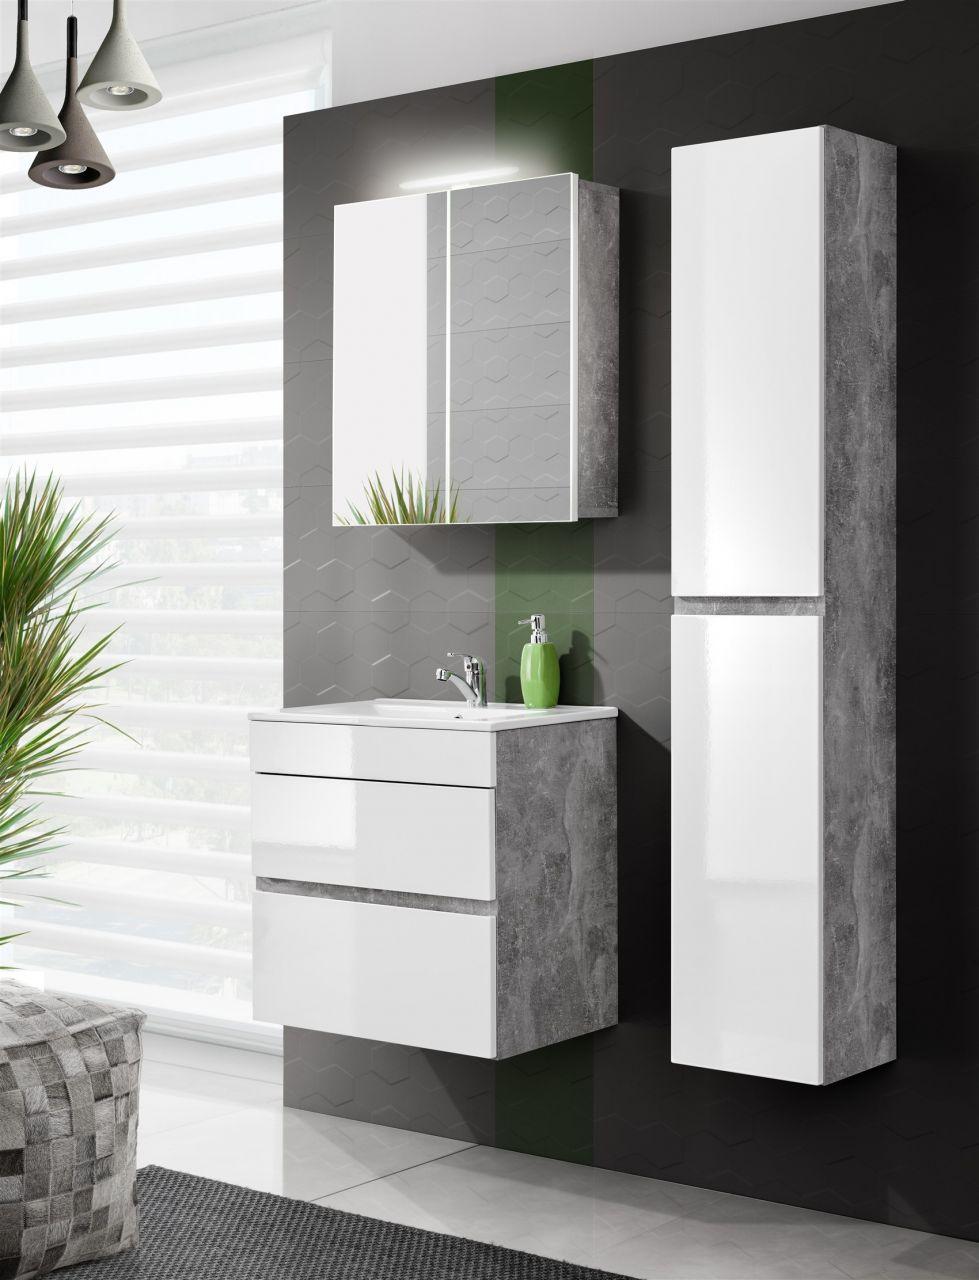 Badezimmer Set | Badmobel 3 Tlg Badezimmerset Teli 2 Beton Weiss Inkl Waschtisch